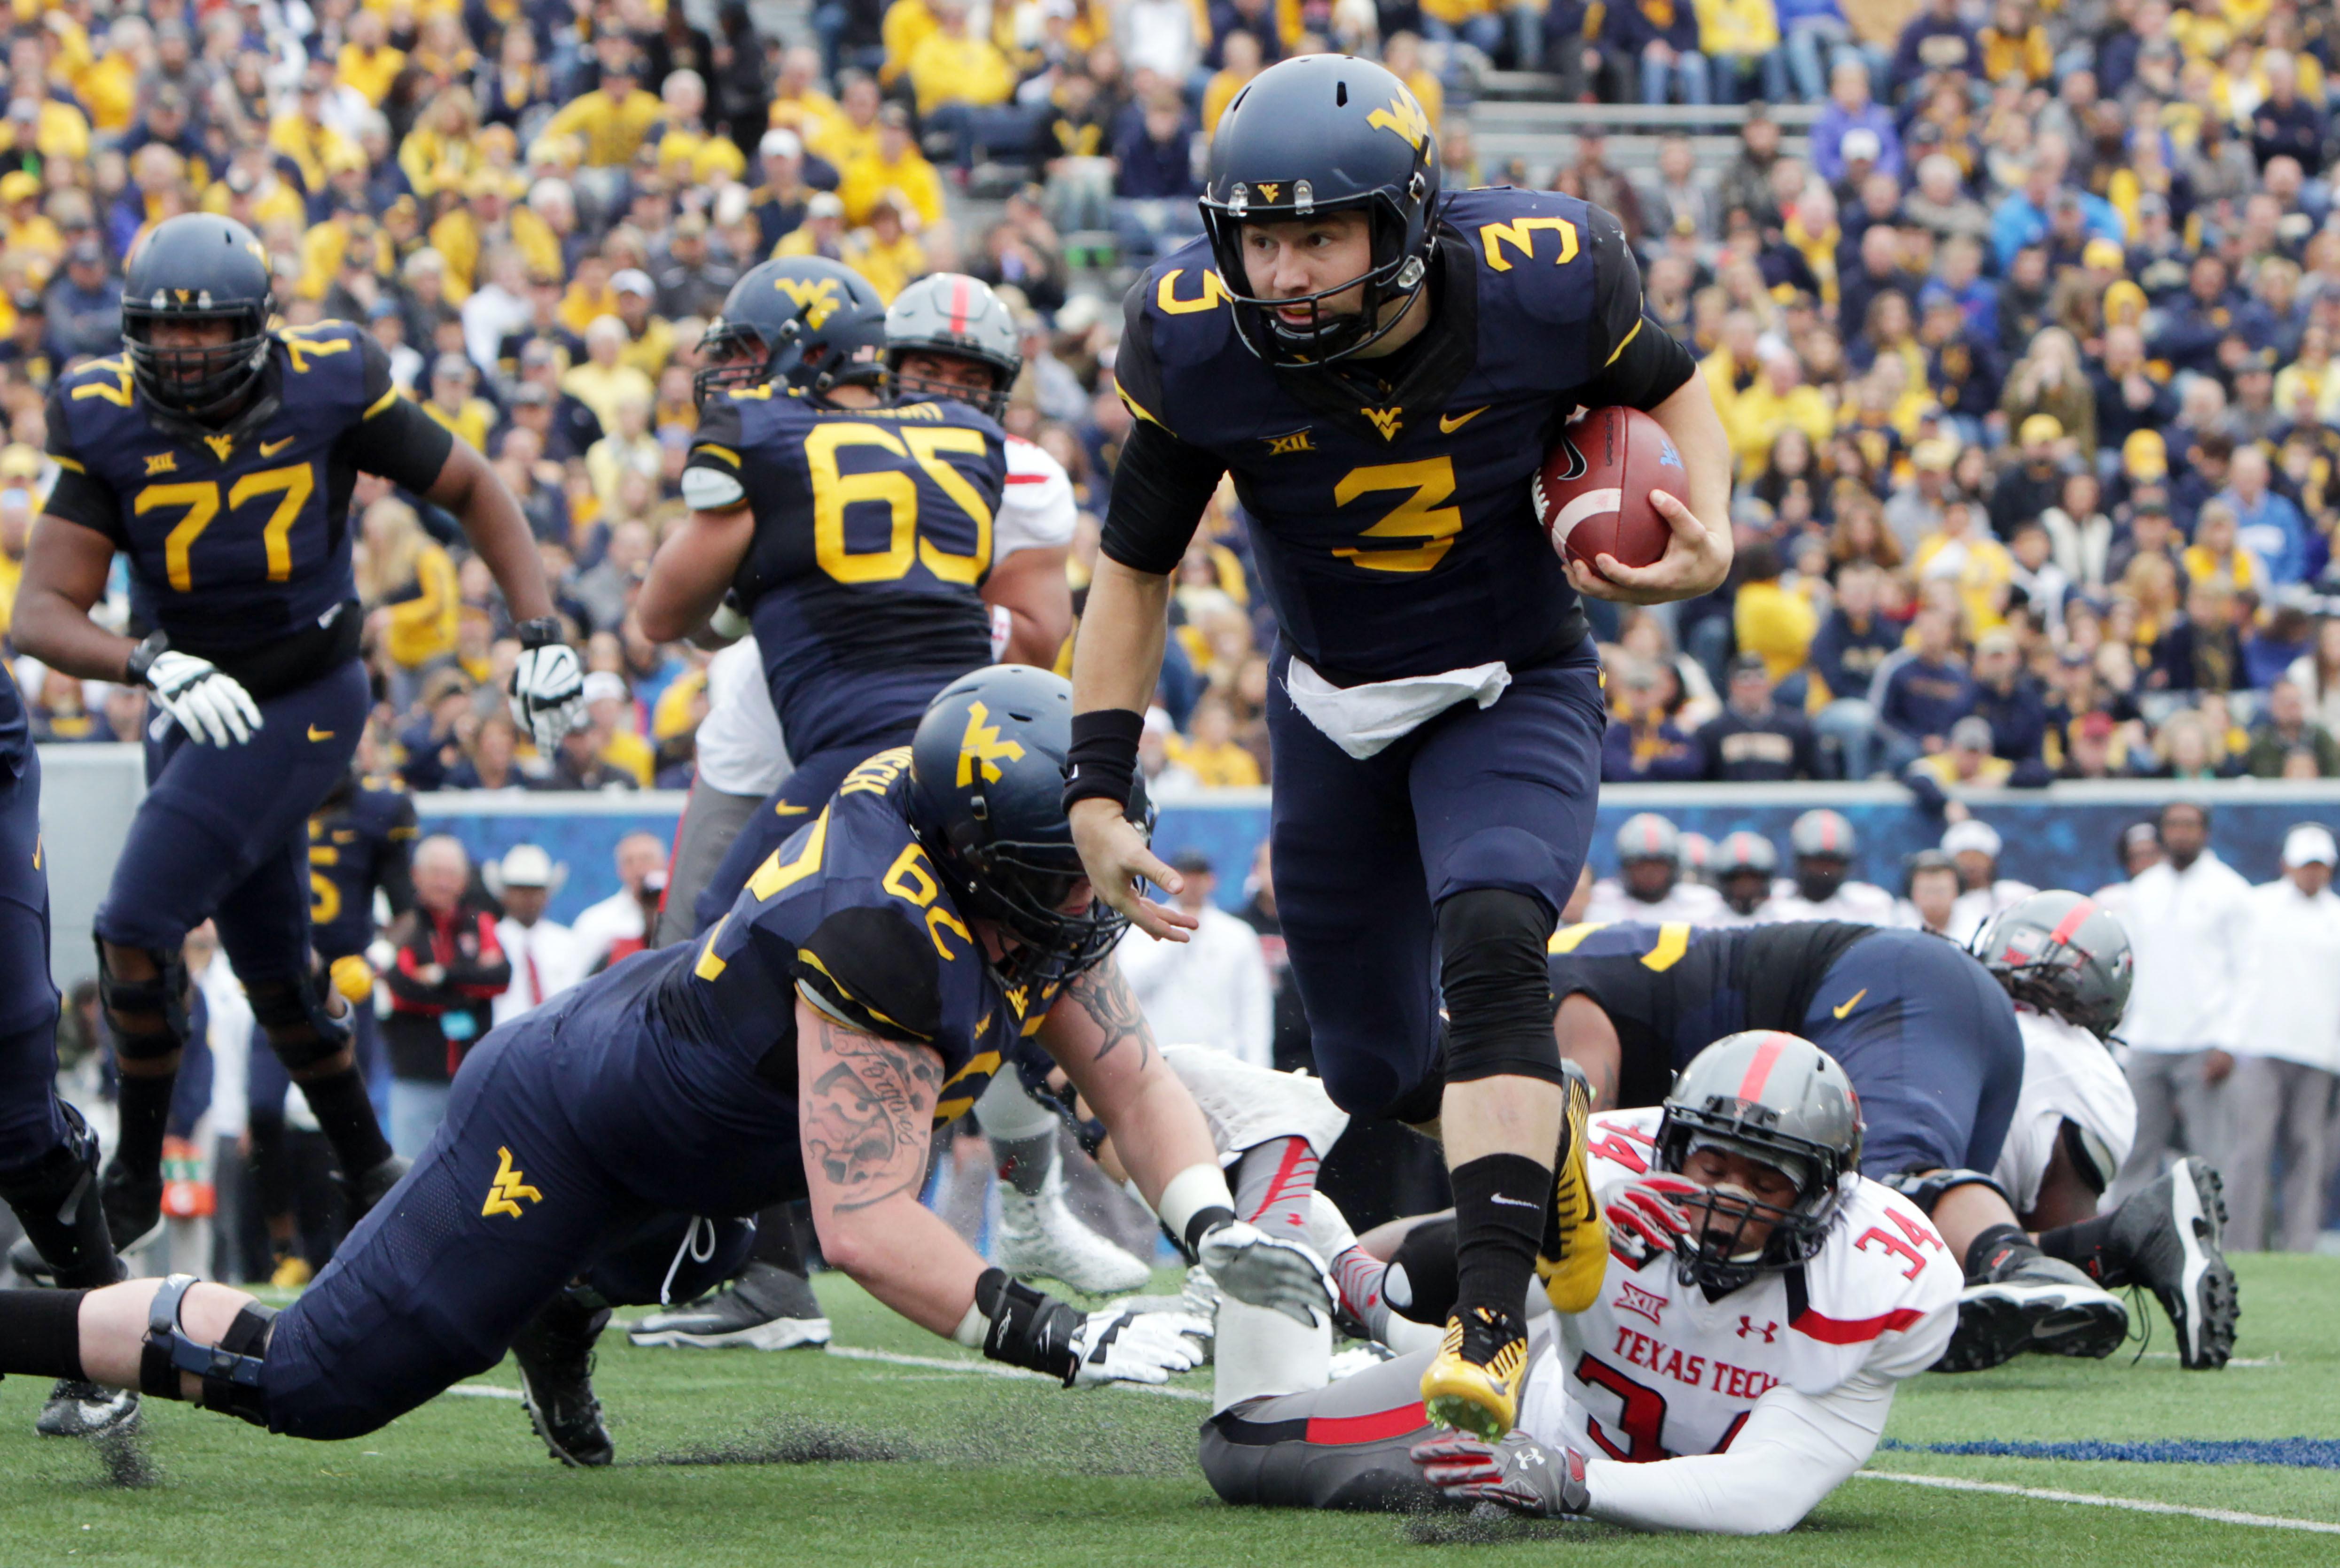 West Virginia quarterback Skyler Howard (3) avoids Texas Tech linebacker D'Vonta Hinton (34)  during the first half of an NCAA college football game, Saturday, Nov. 7, 2015, in Morgantown, W.Va. (AP Photo/Raymond Thompson)